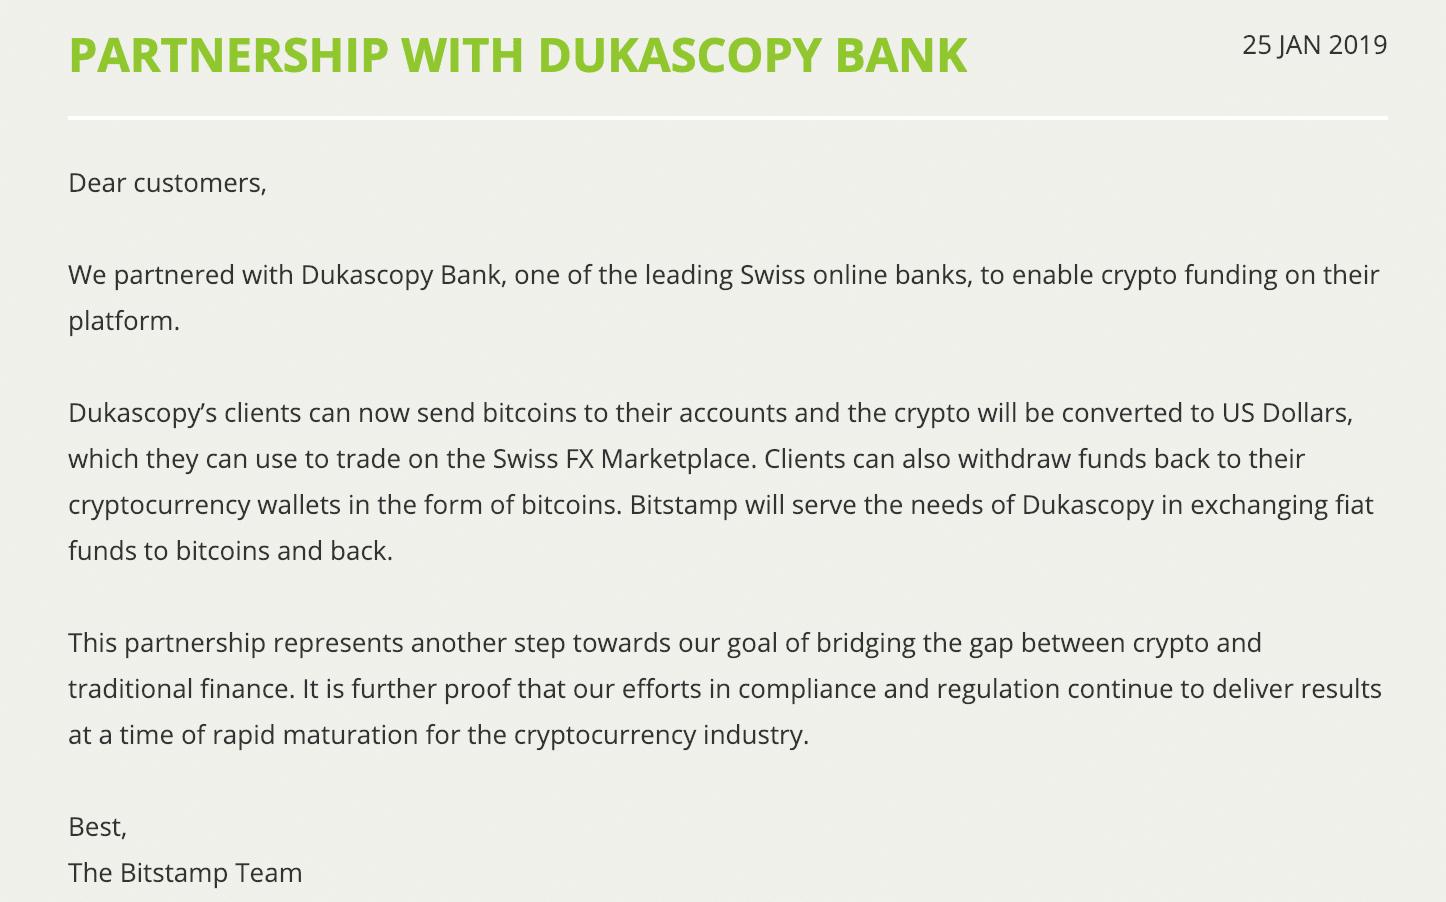 bitstamp-ducascopy-partnership